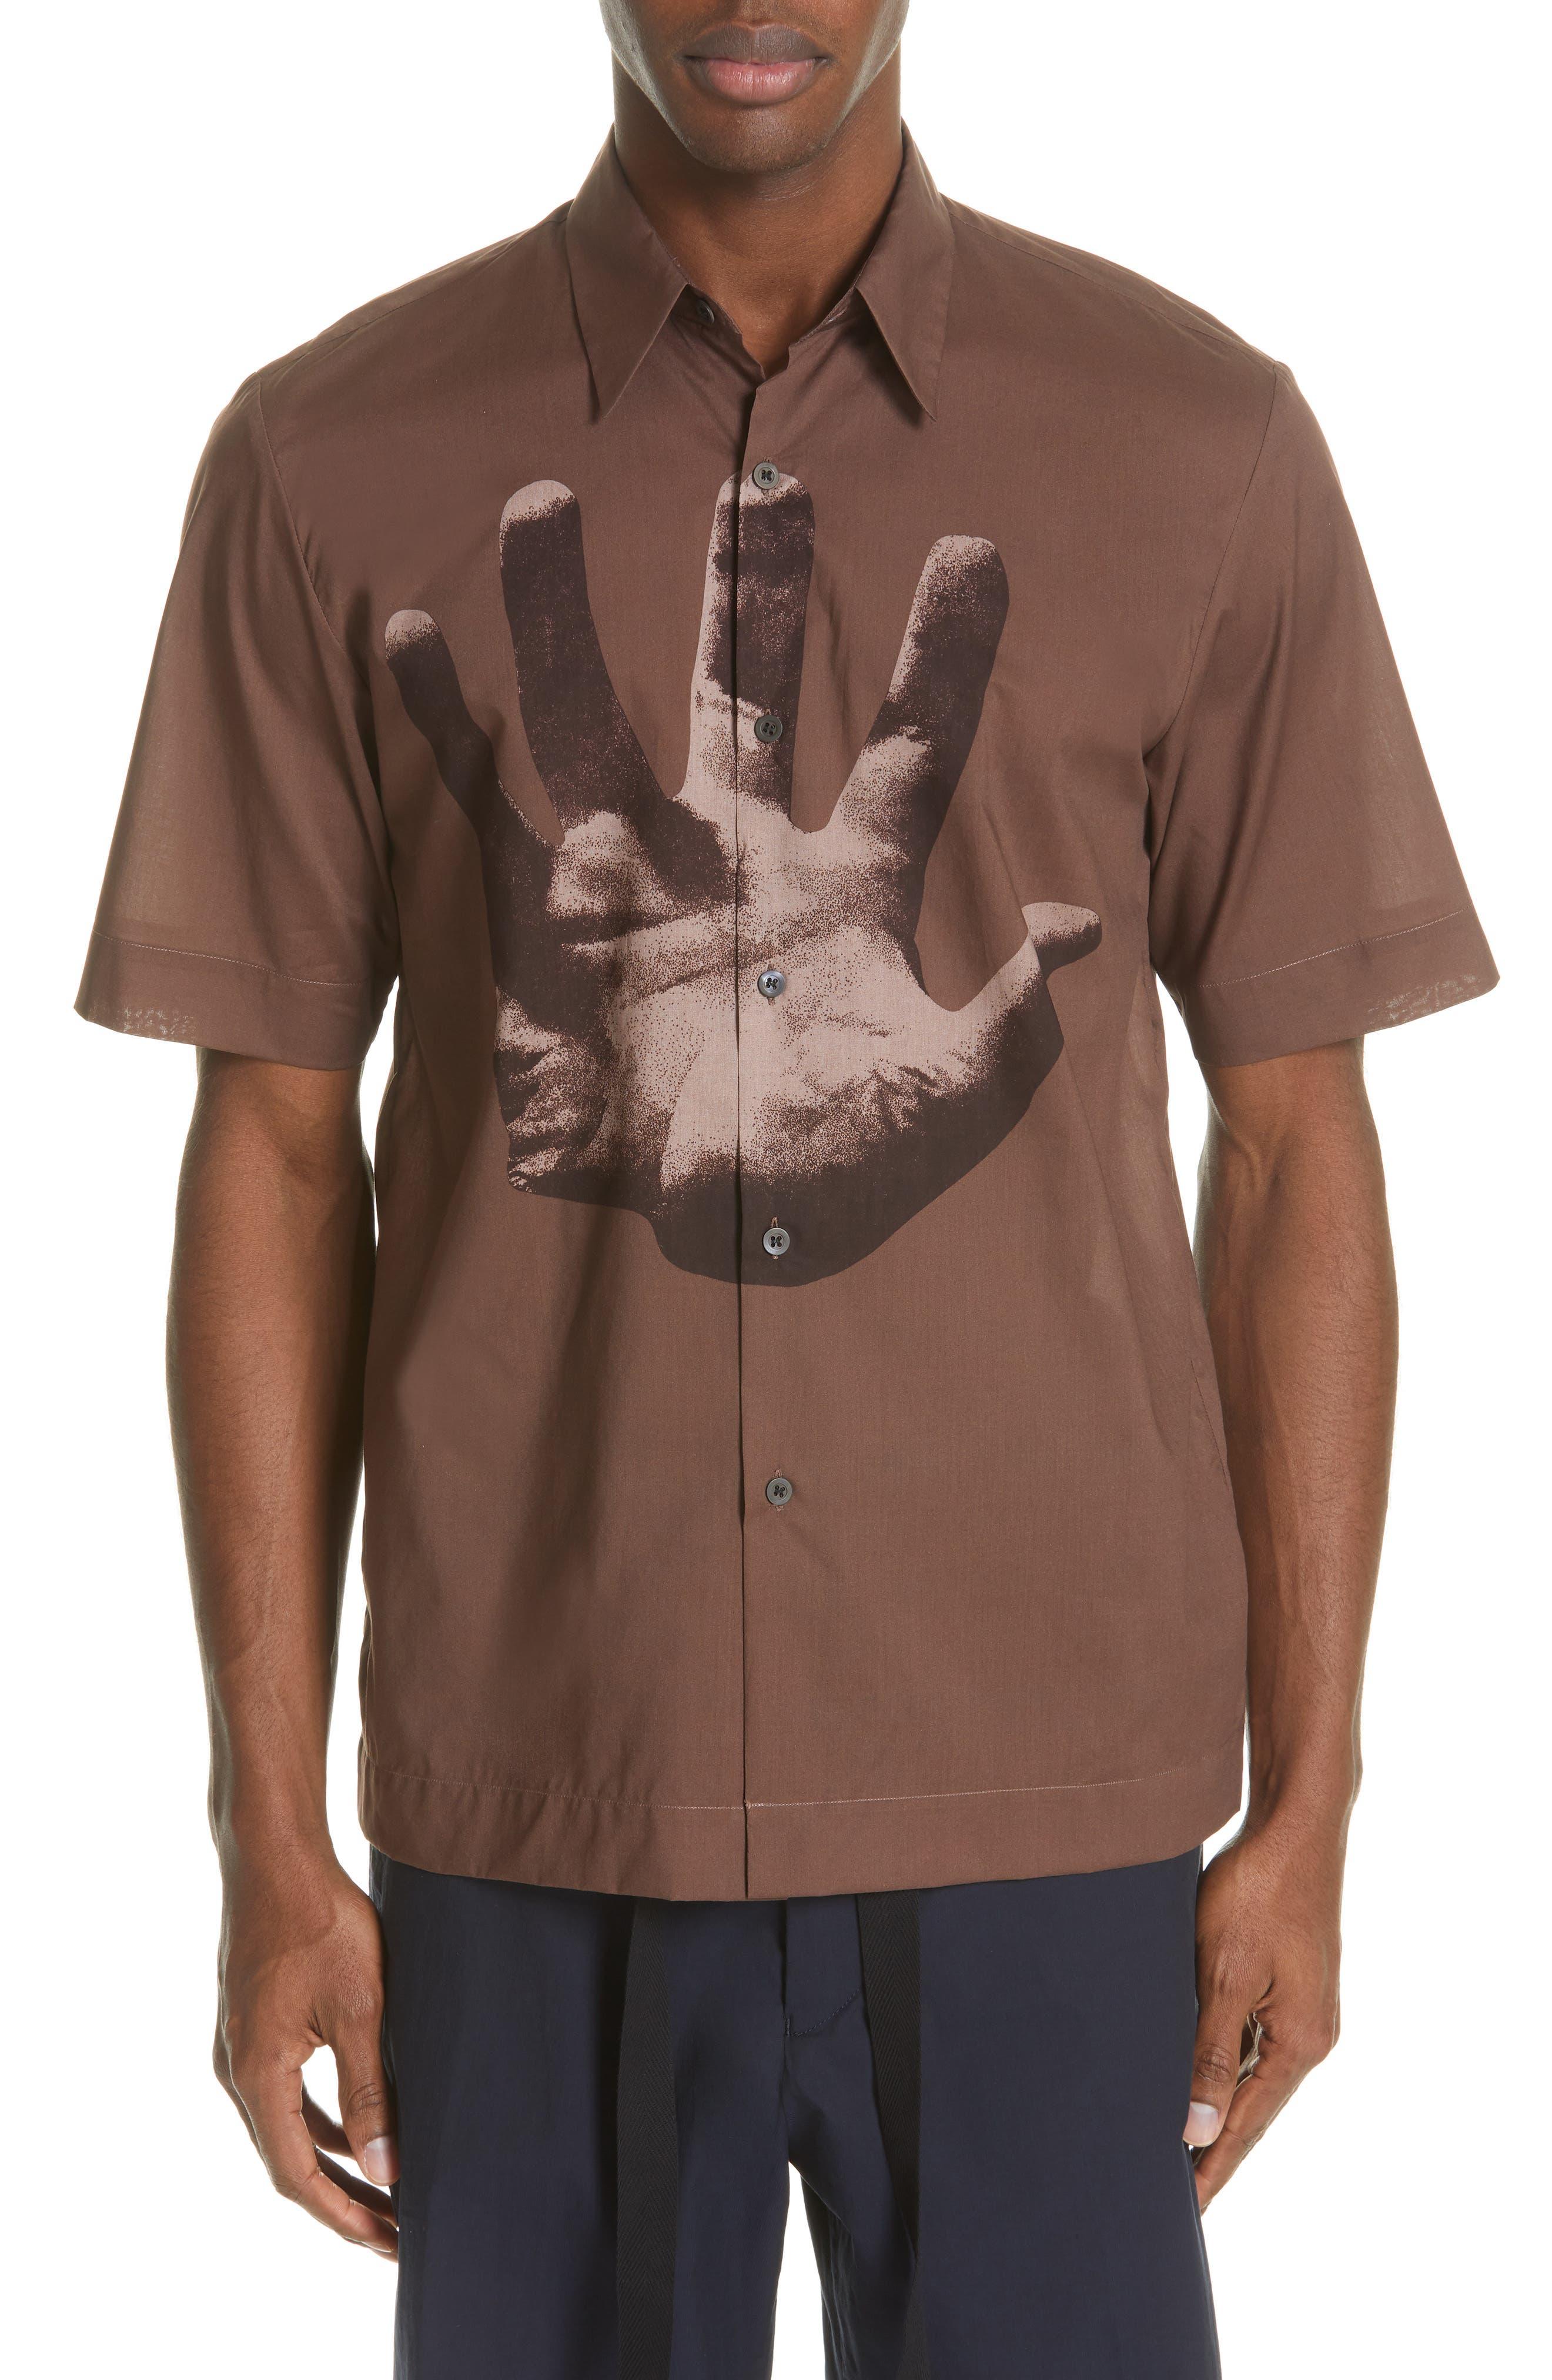 DRIES VAN NOTEN Clasen Hand Print Shirt, Main, color, BROWN